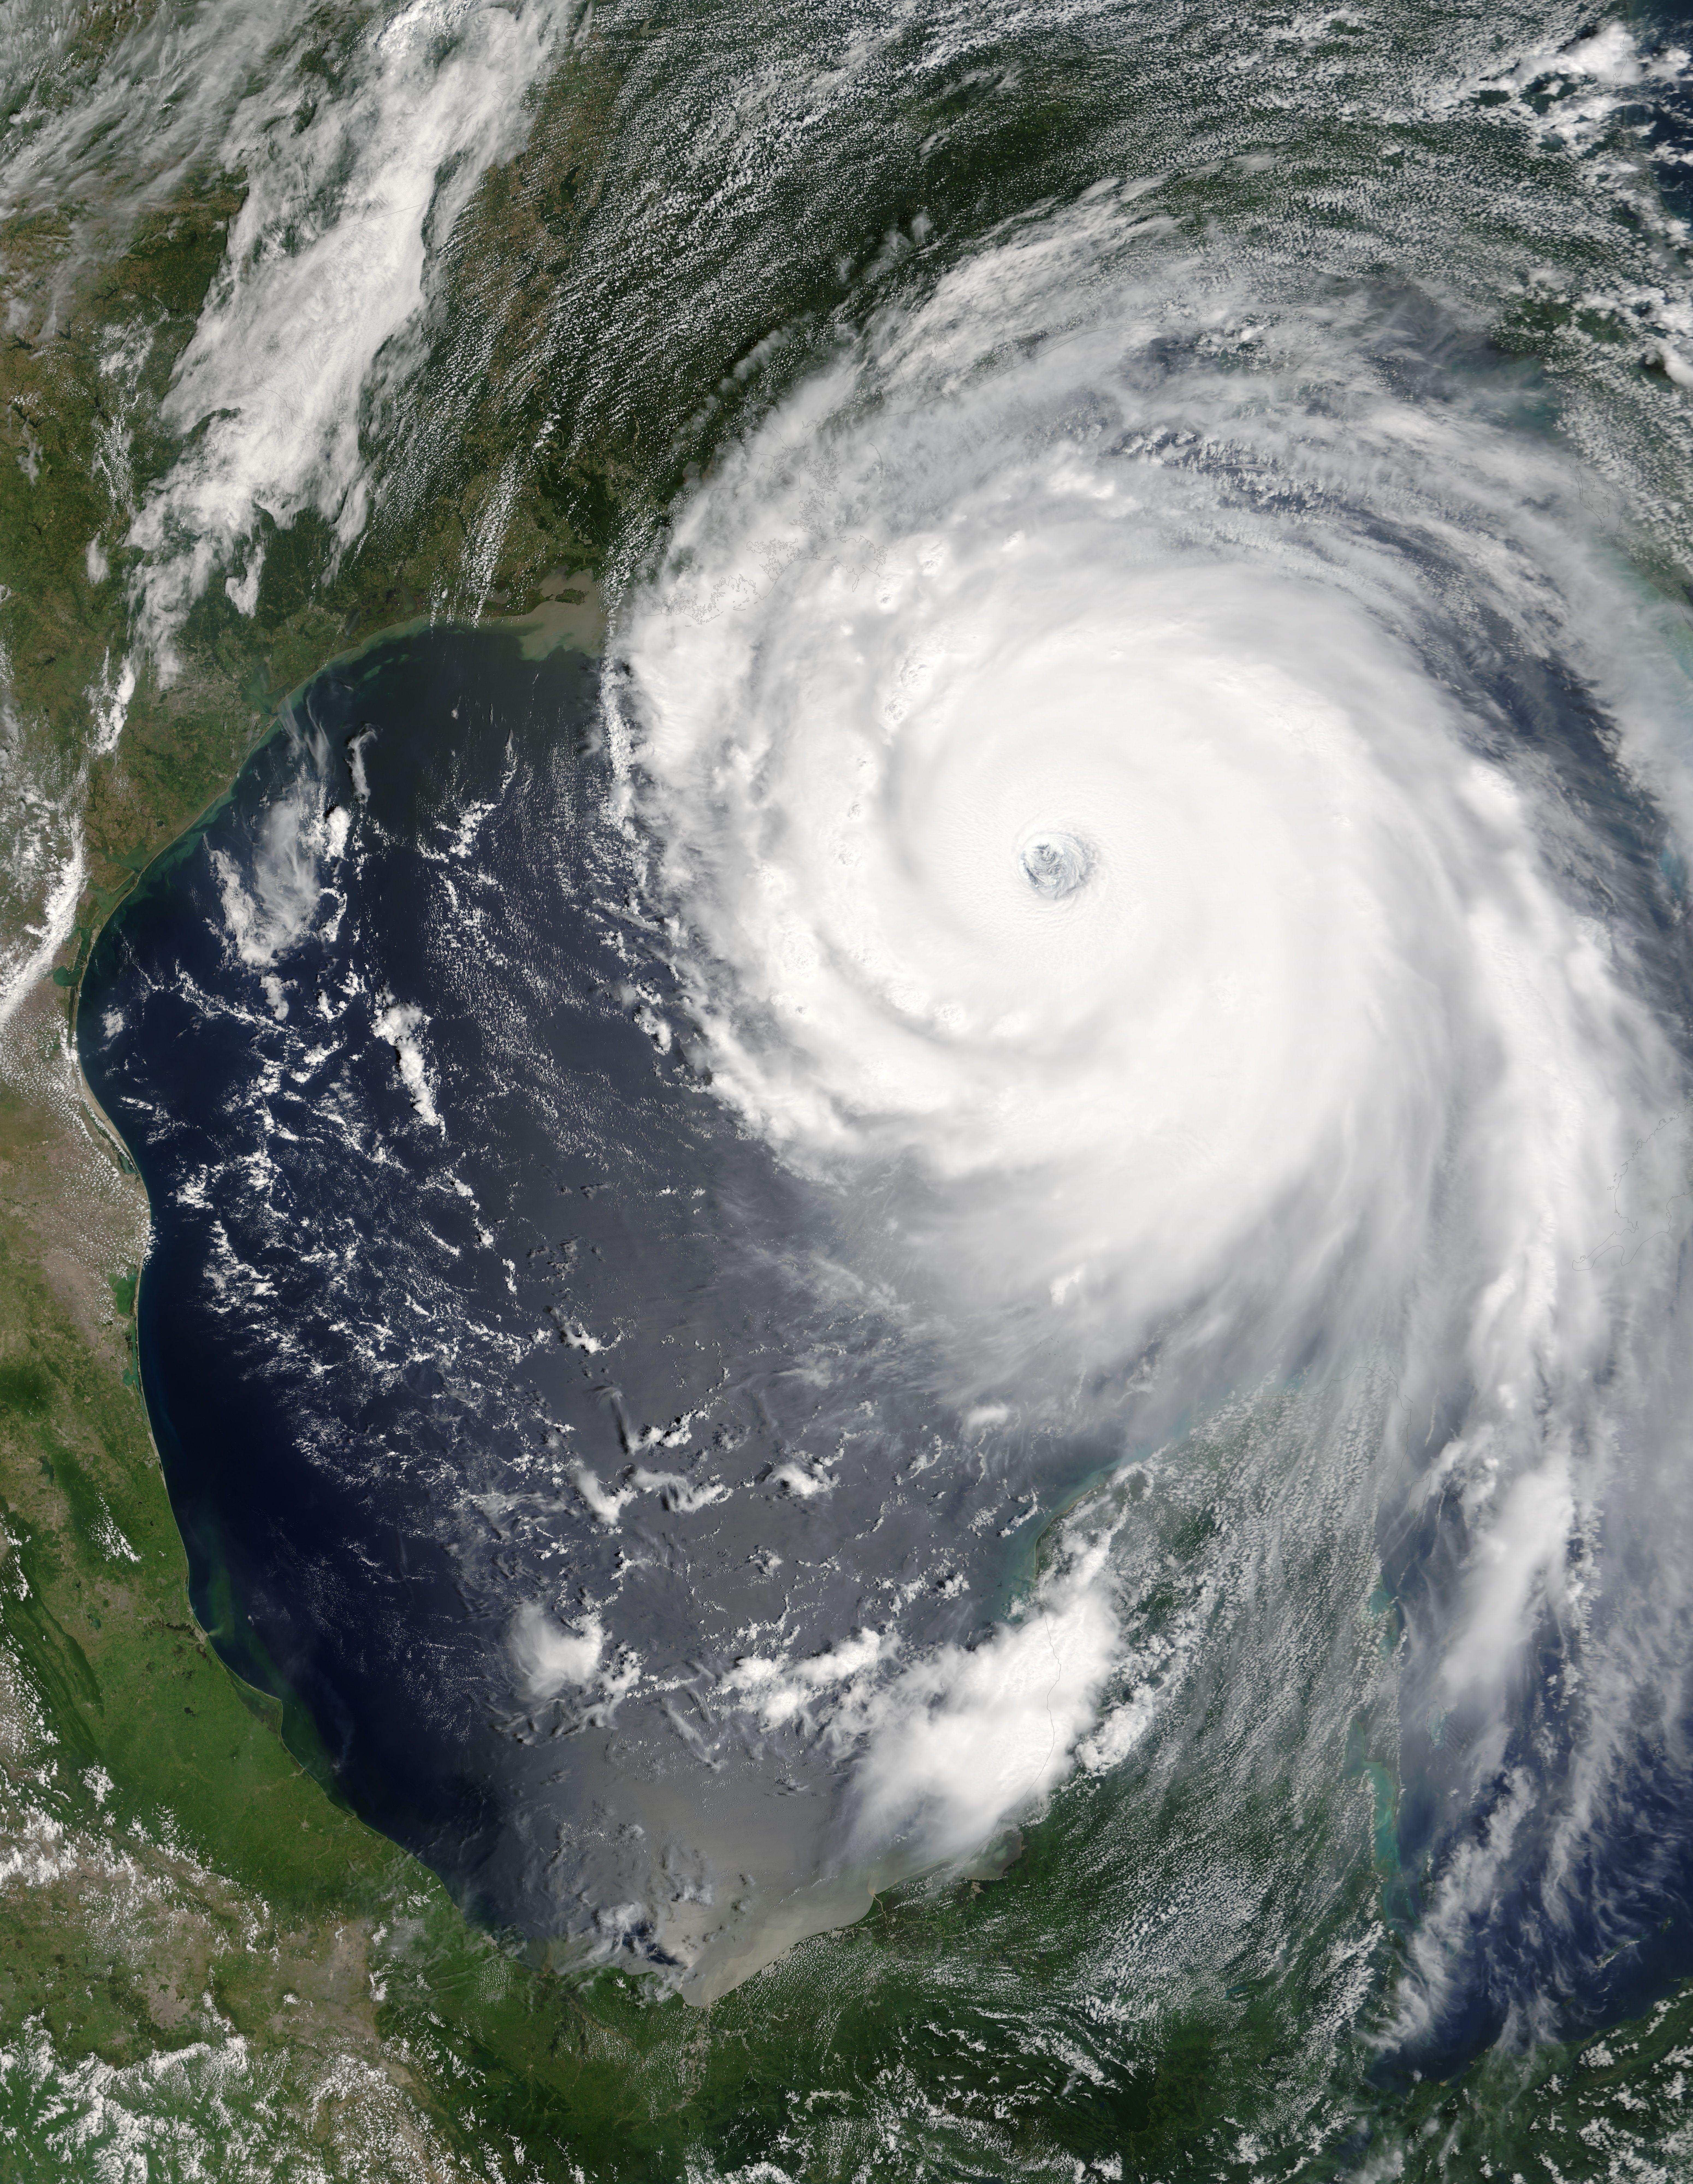 Hurricane Katrina Destroyed New Orleans In Aug 2005 Con Imagenes Desastres Naturales Huracan Katrina Circulo De Vida